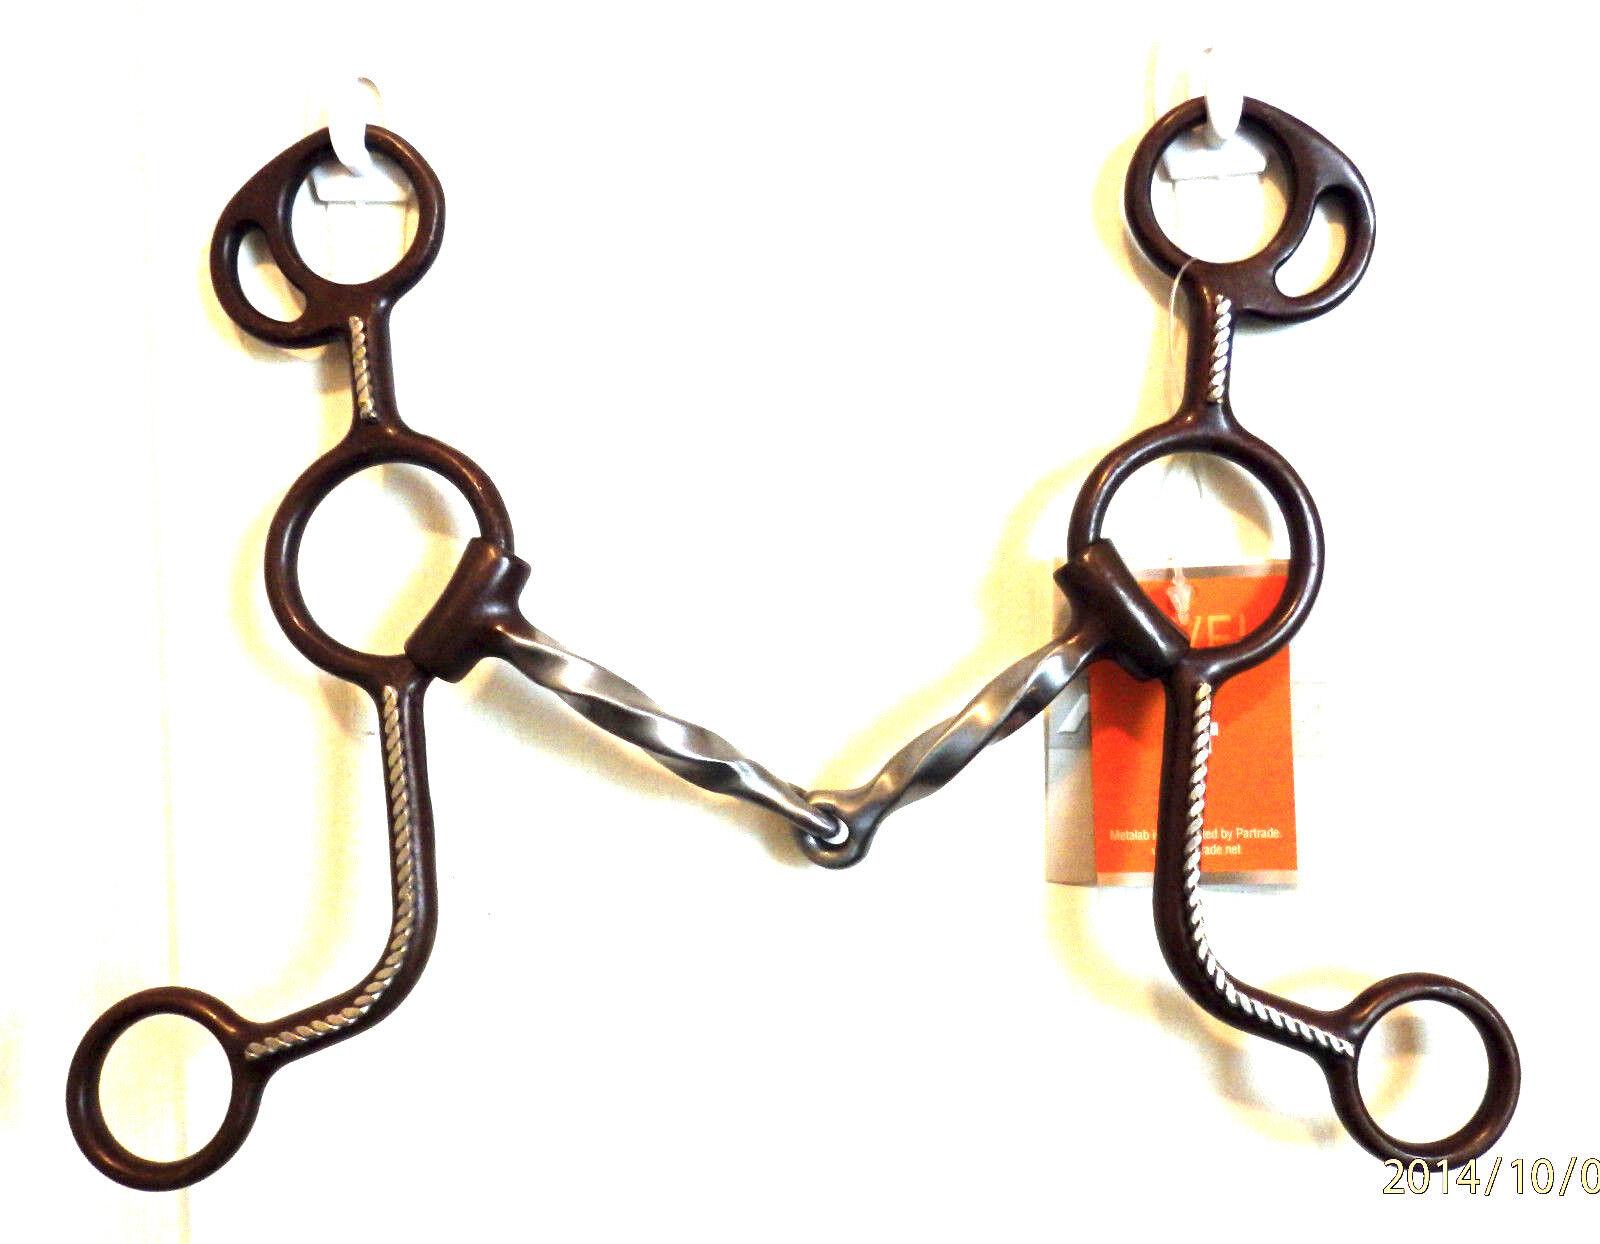 Metalab Antique  SS rope trim  twisted gag affect 230033 western bit